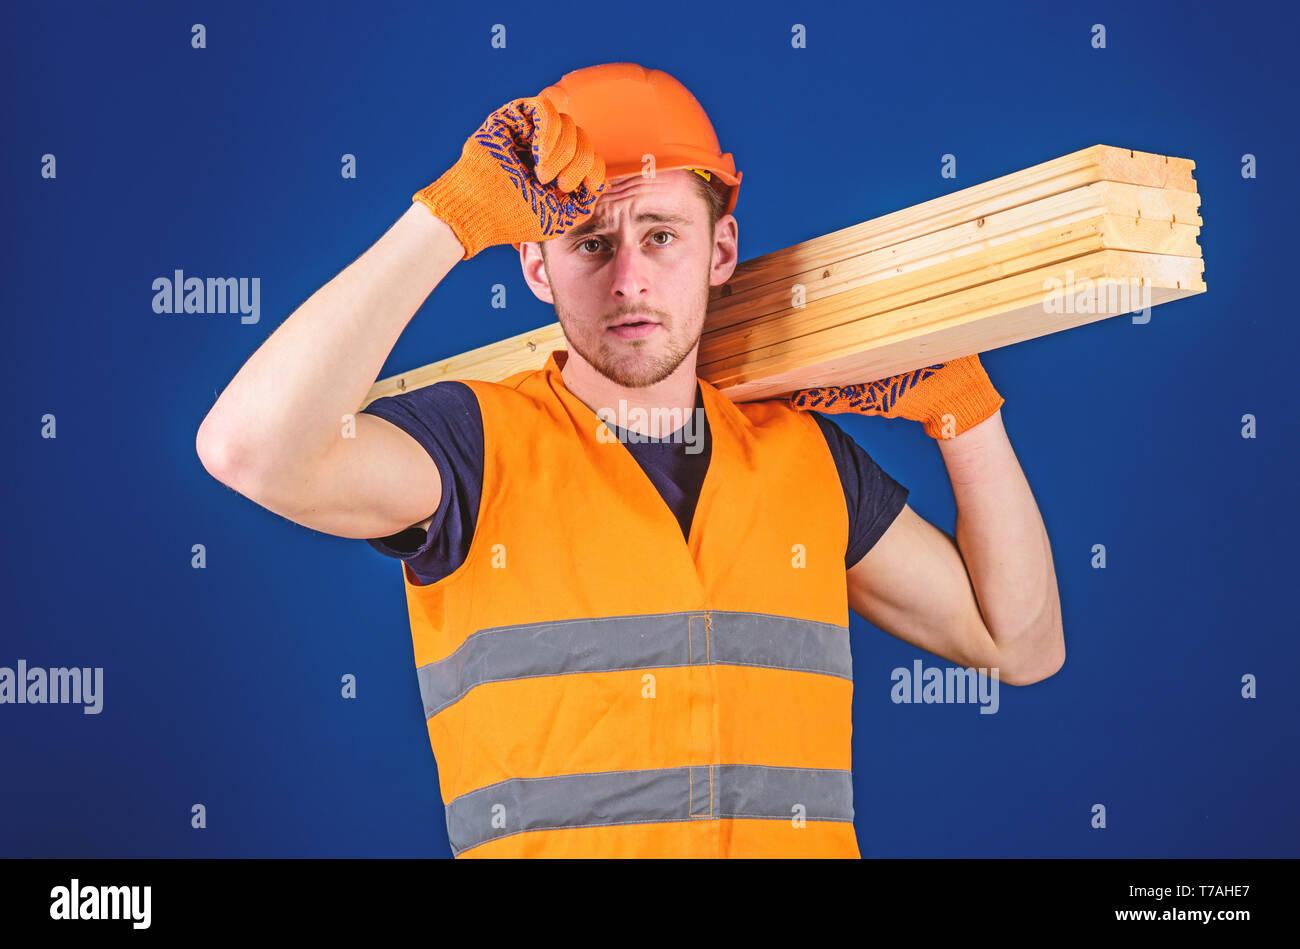 Carpenter, woodworker, labourer, builder carries wooden beam on shoulder. Woodworker concept. Man in protective gloves holds visor of helmet, corrects hard hat on head, blue background. Stock Photo